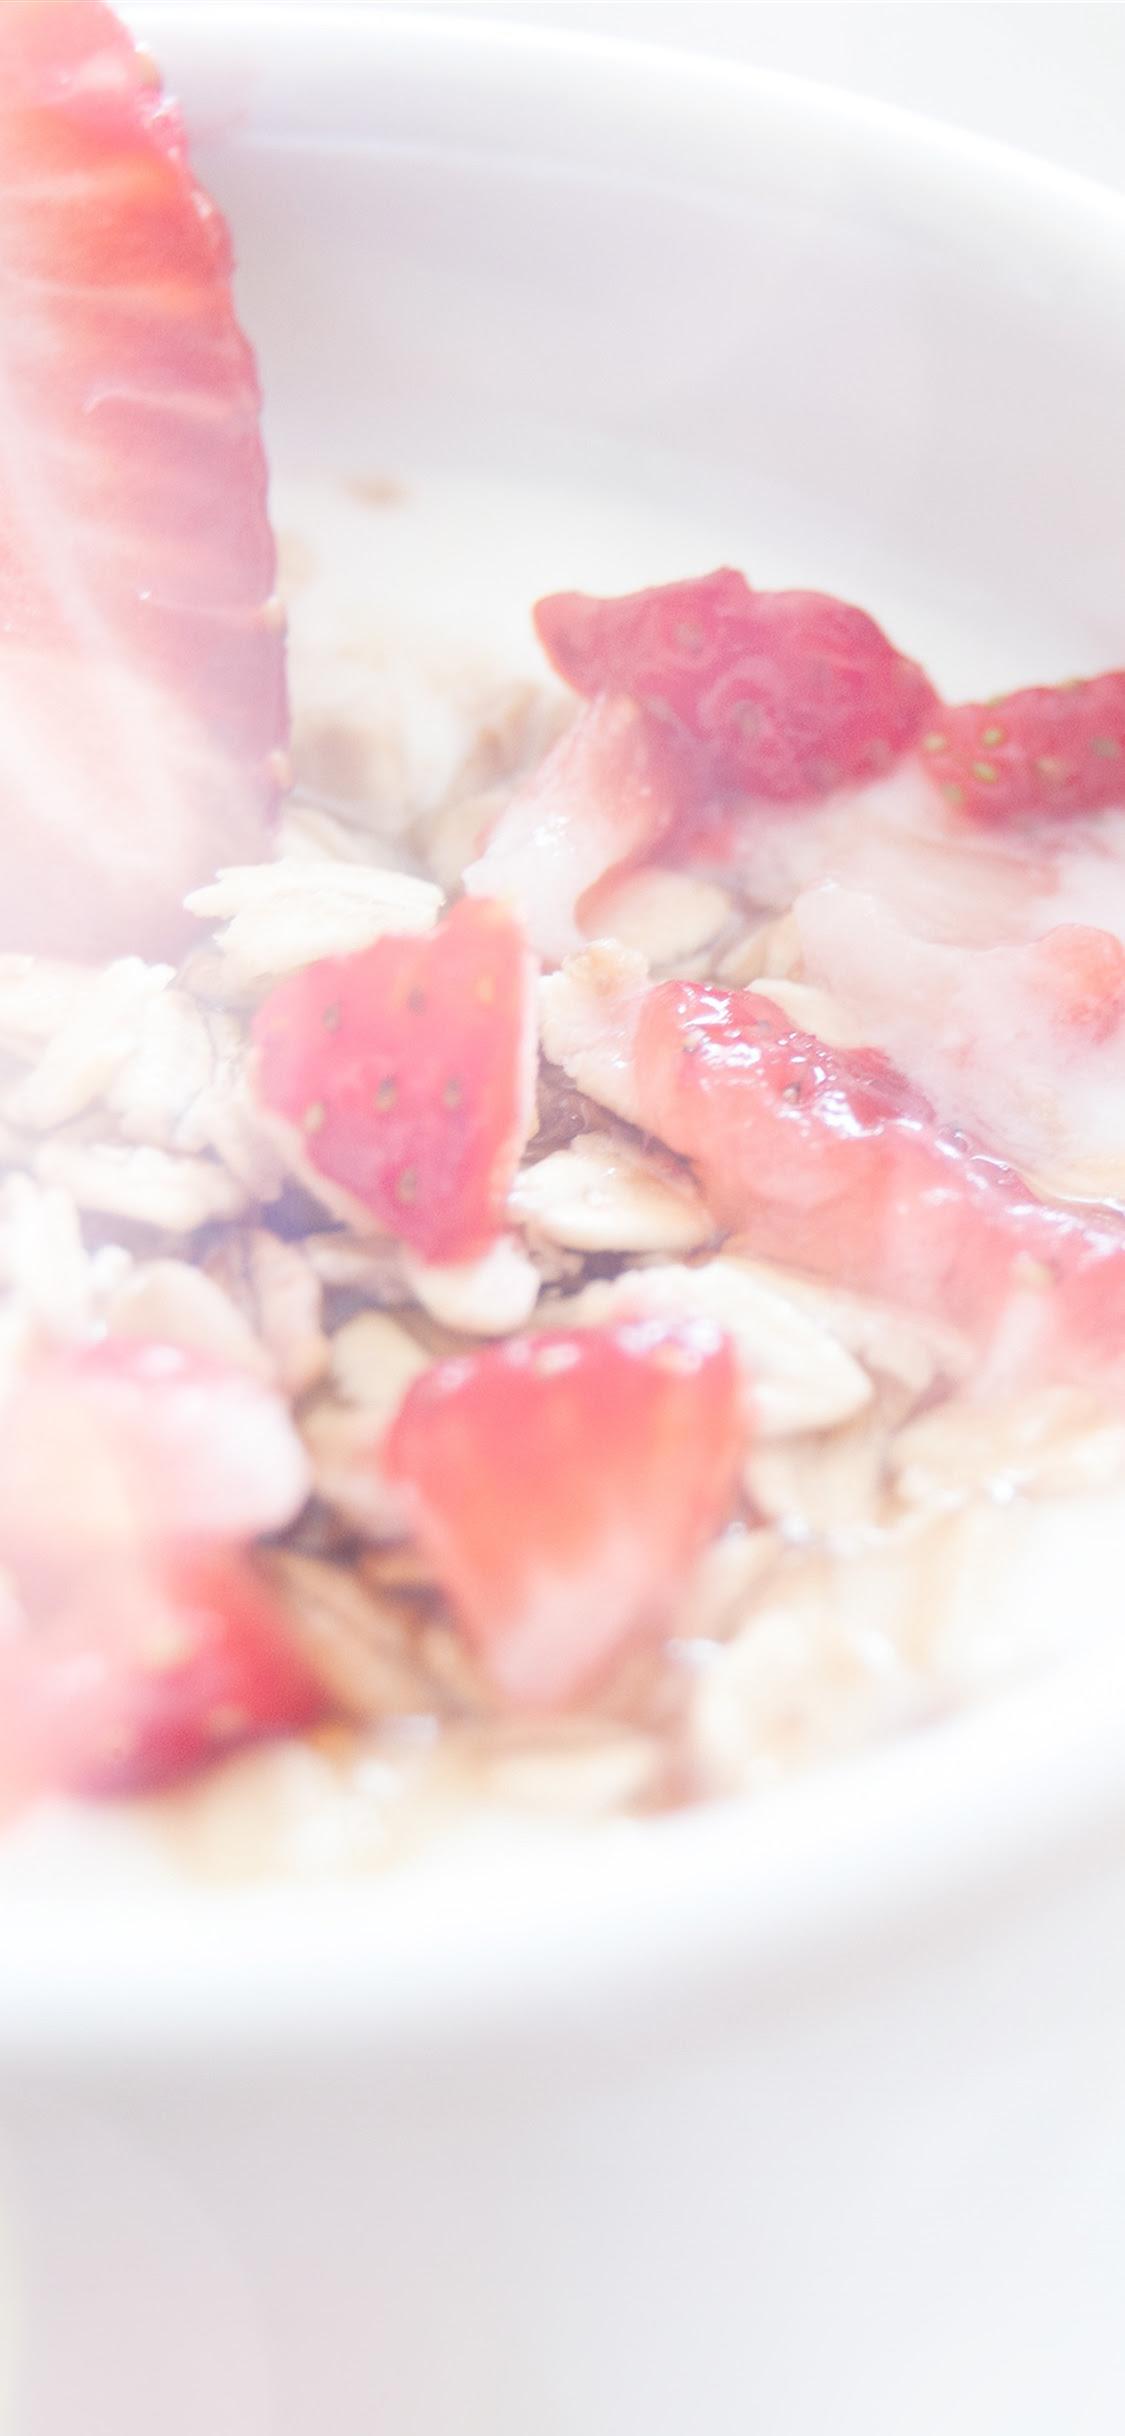 Iphonepapers Com Iphone Wallpaper Mq62 Strawberry Frost Milk